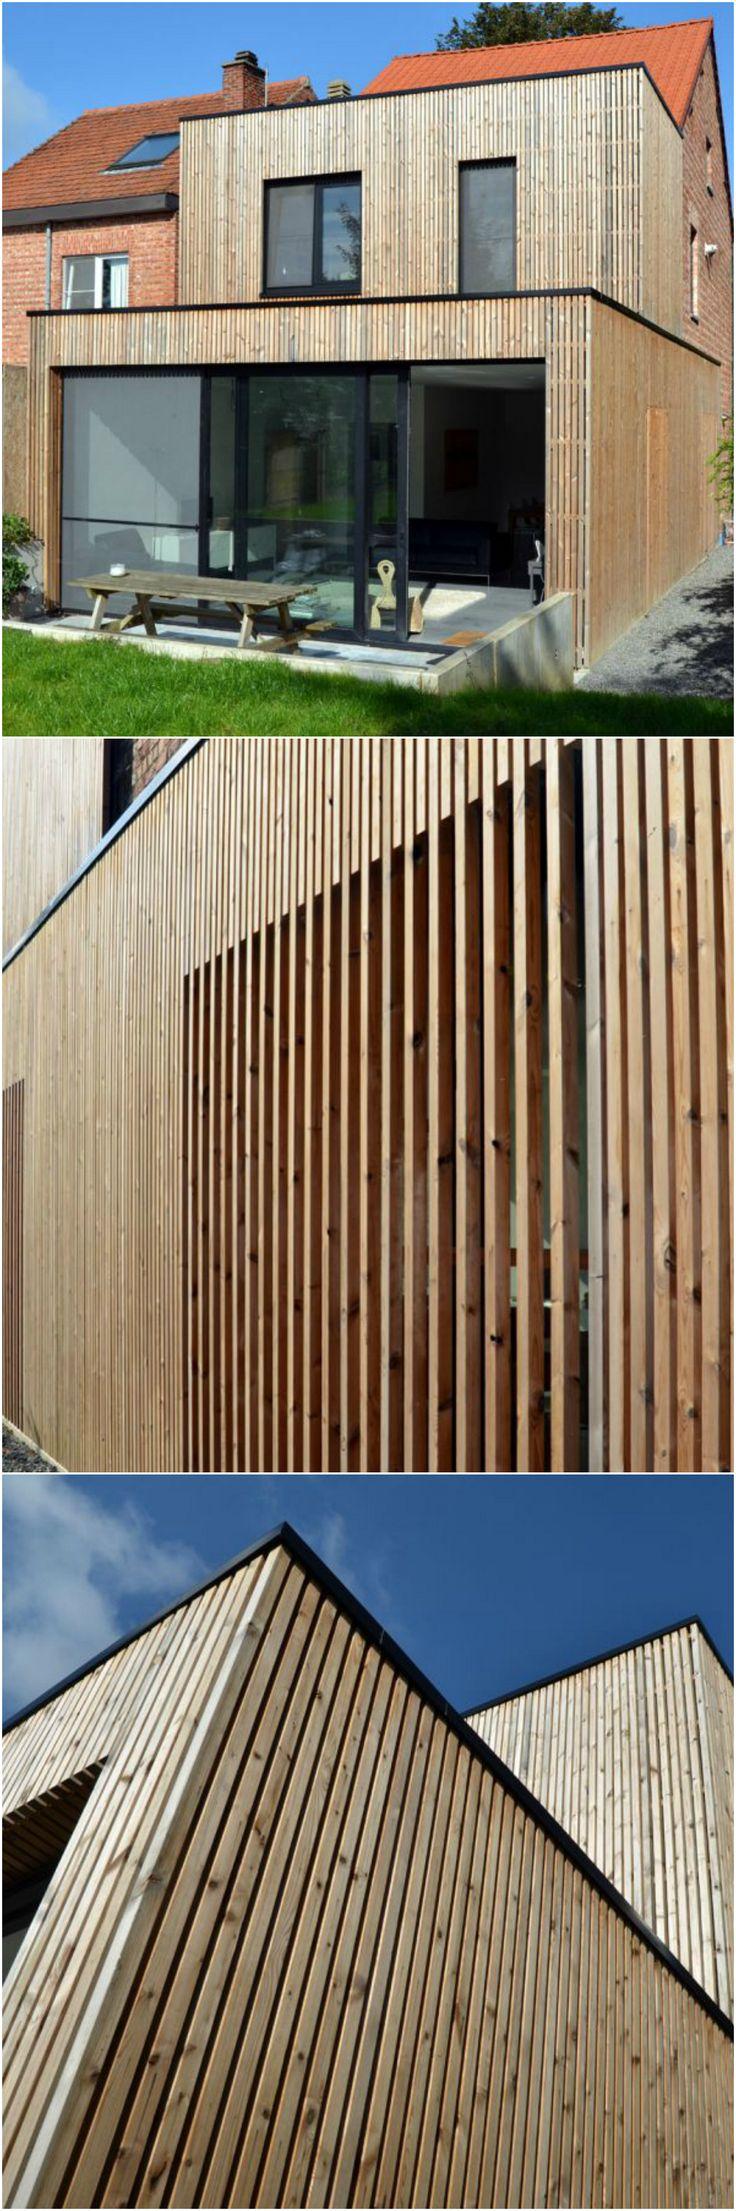 Renovatie • modern • houten gevelbekleding • terras • beton • Architect: Steven Peeters